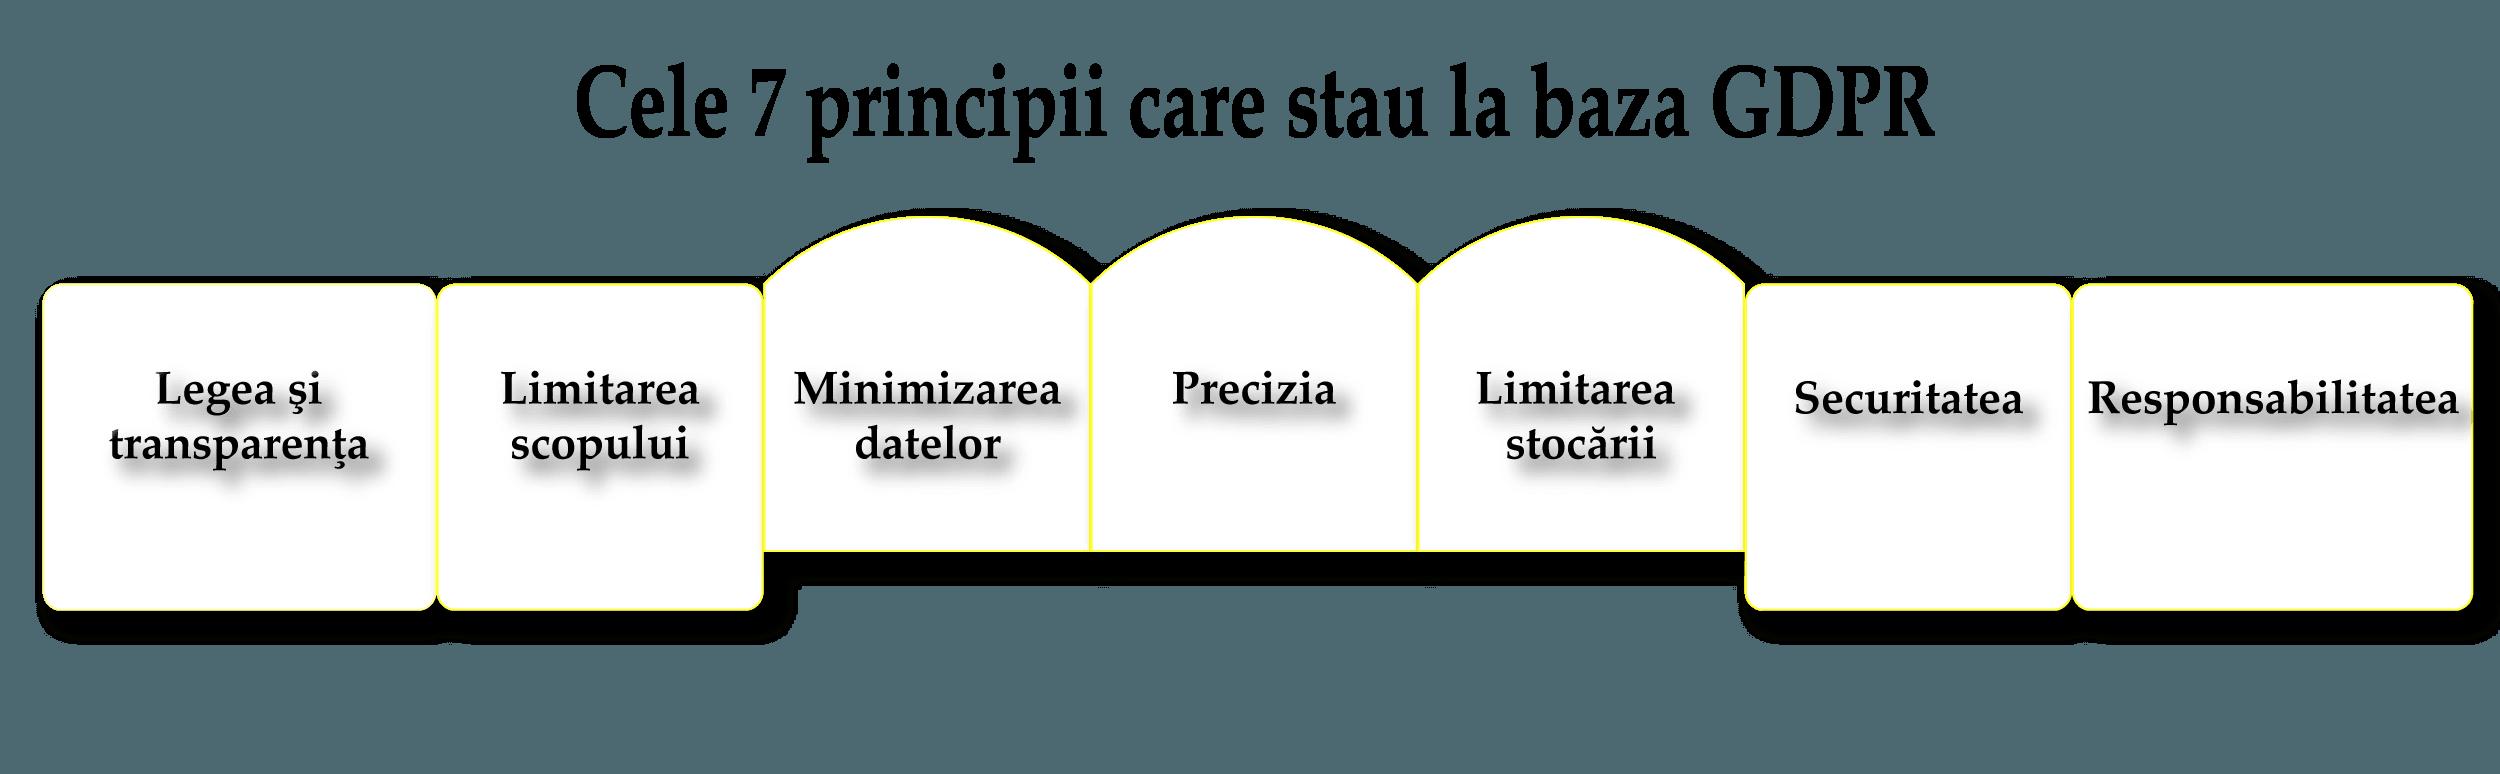 PRINCIPII GDPR